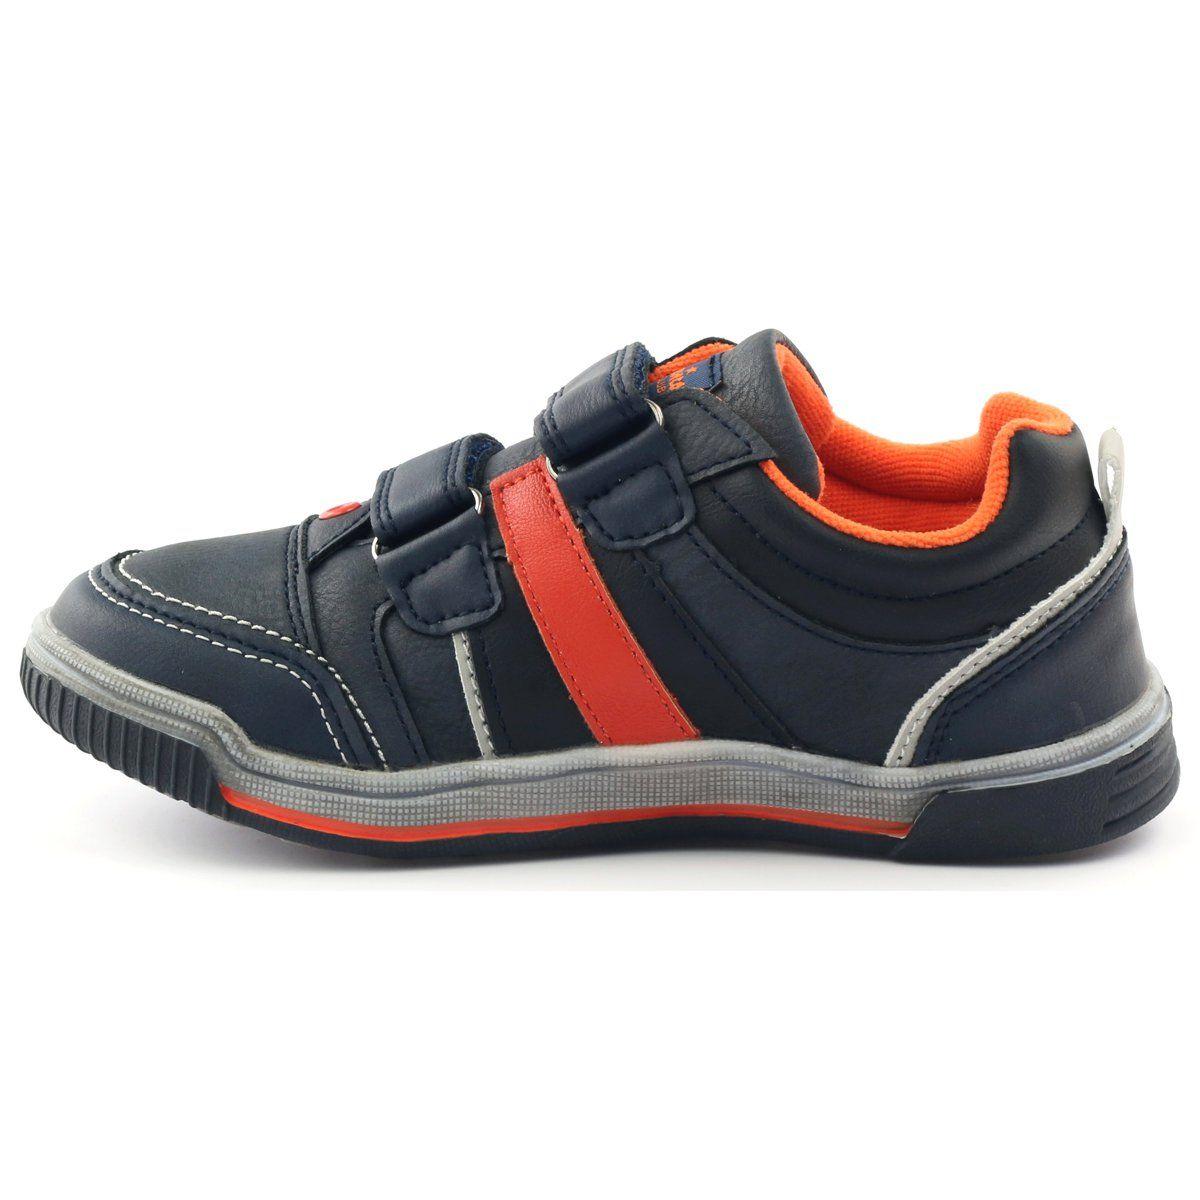 American Club Adi Buty Sportowe Trampki American 152625 Granatowe Pomaranczowe Calzado Ninos Calzas Ninos